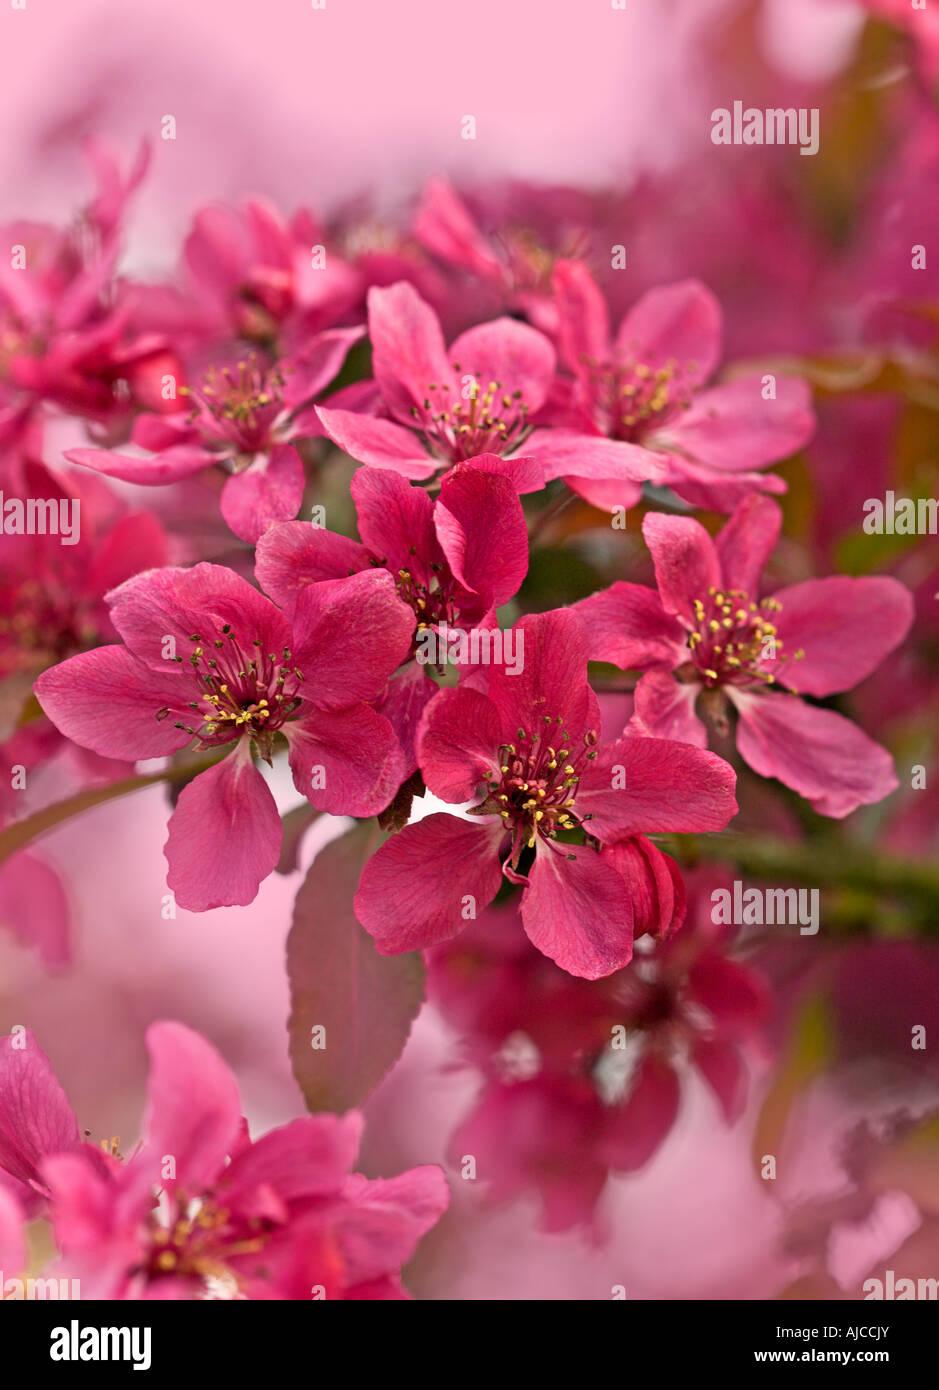 Malus Aldenhamensis Pink Flowering Crab Apple Blossom Stock Photo